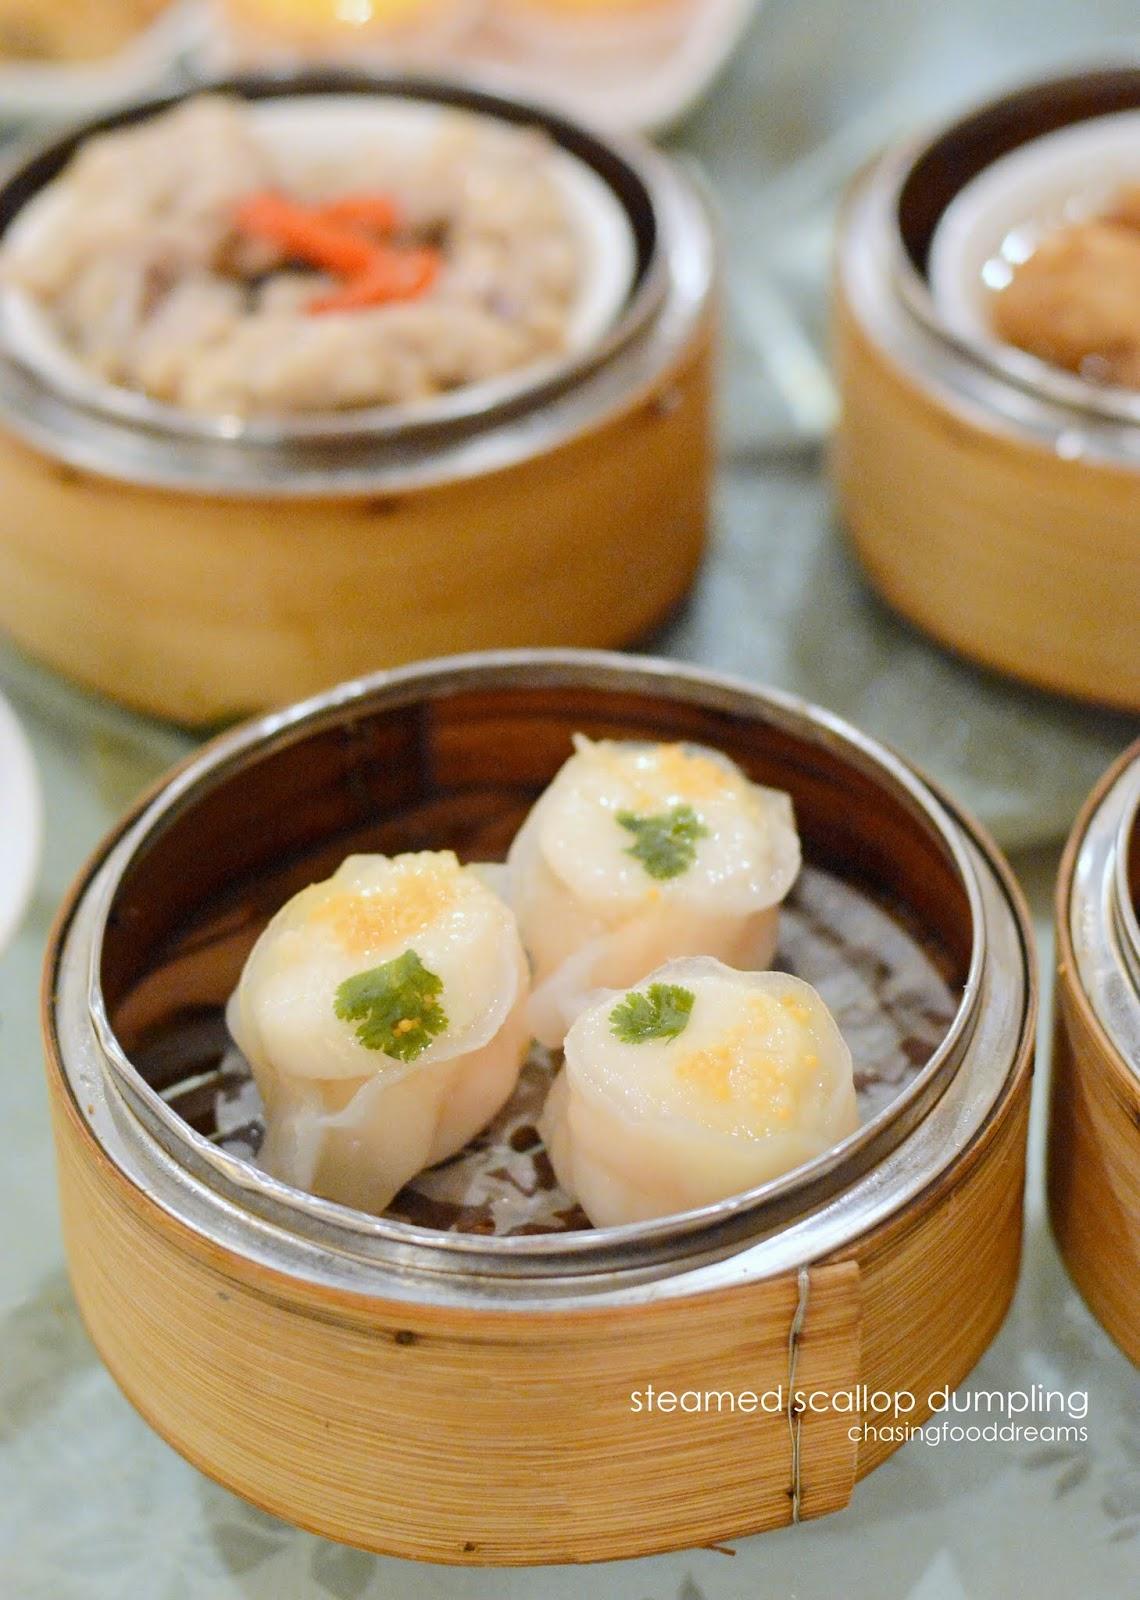 Chasing Food Dreams Dim Sum At Xin Cuisine Concorde Hotel Kuala Lumpur